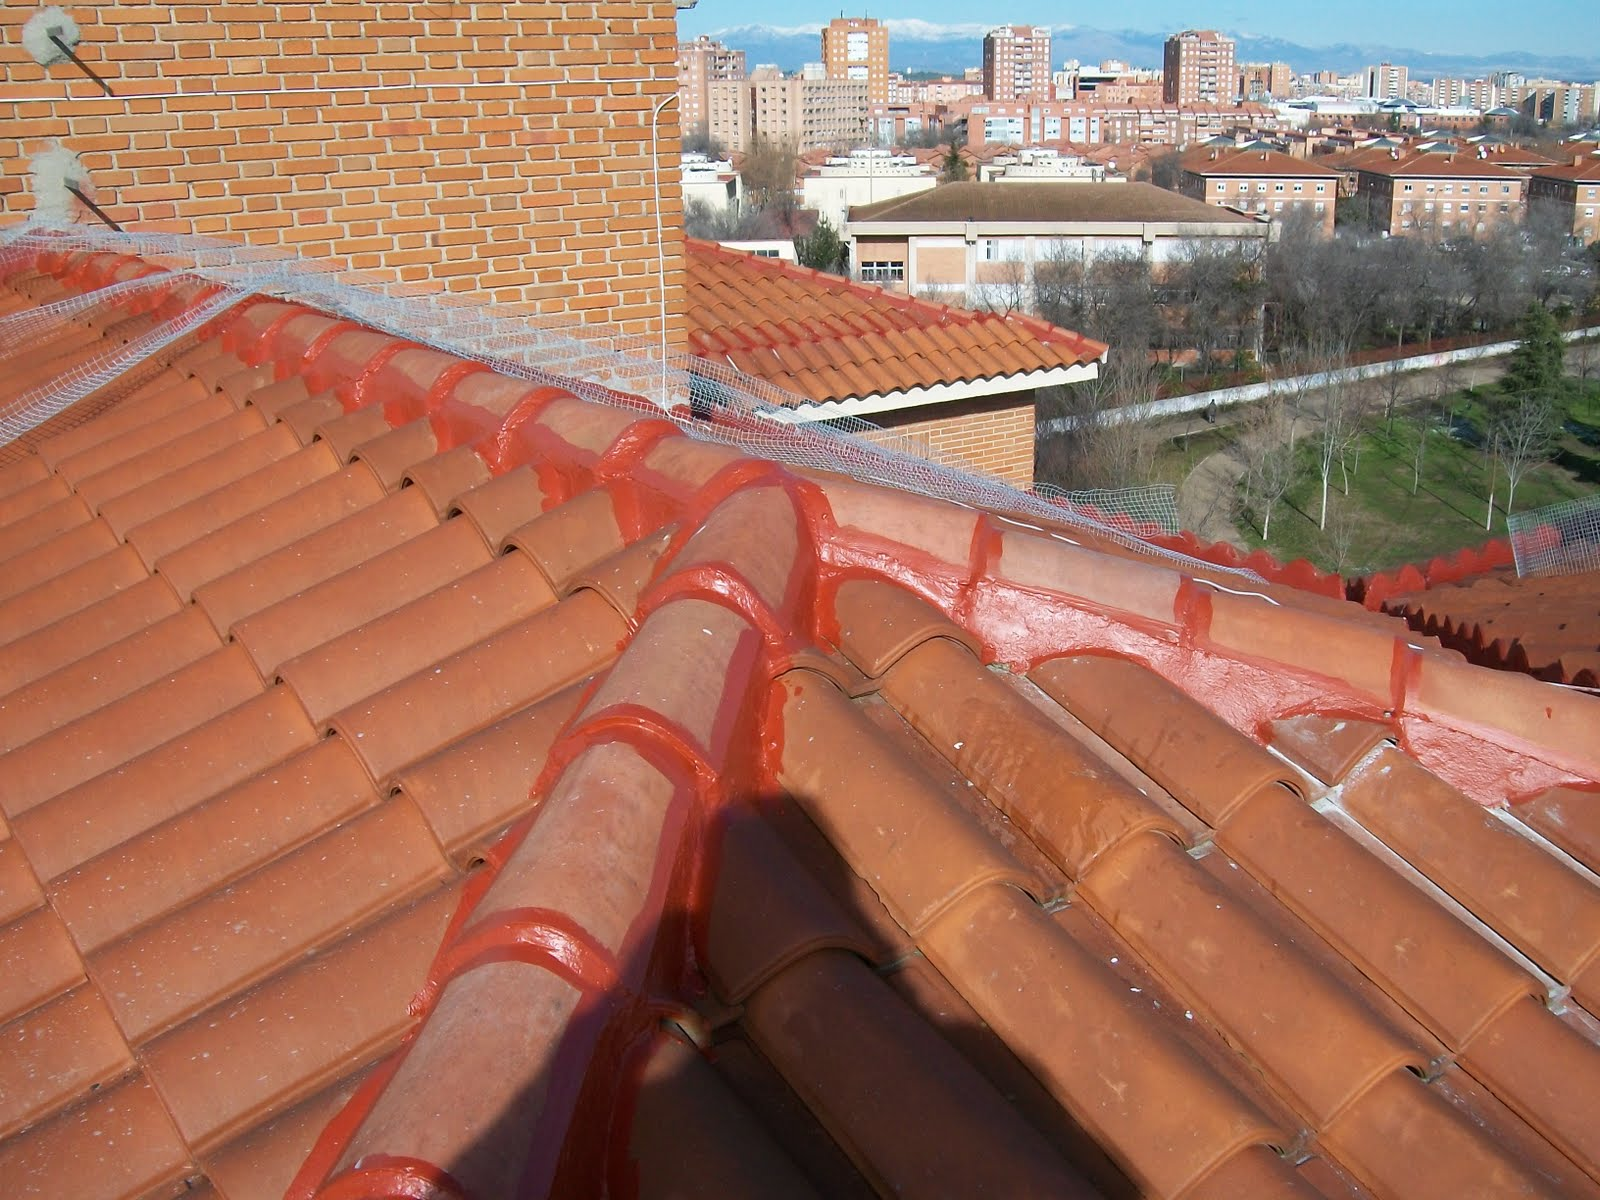 Cubiertas impermeabilizar tejados teja portuguesa teja - Como impermeabilizar madera ...